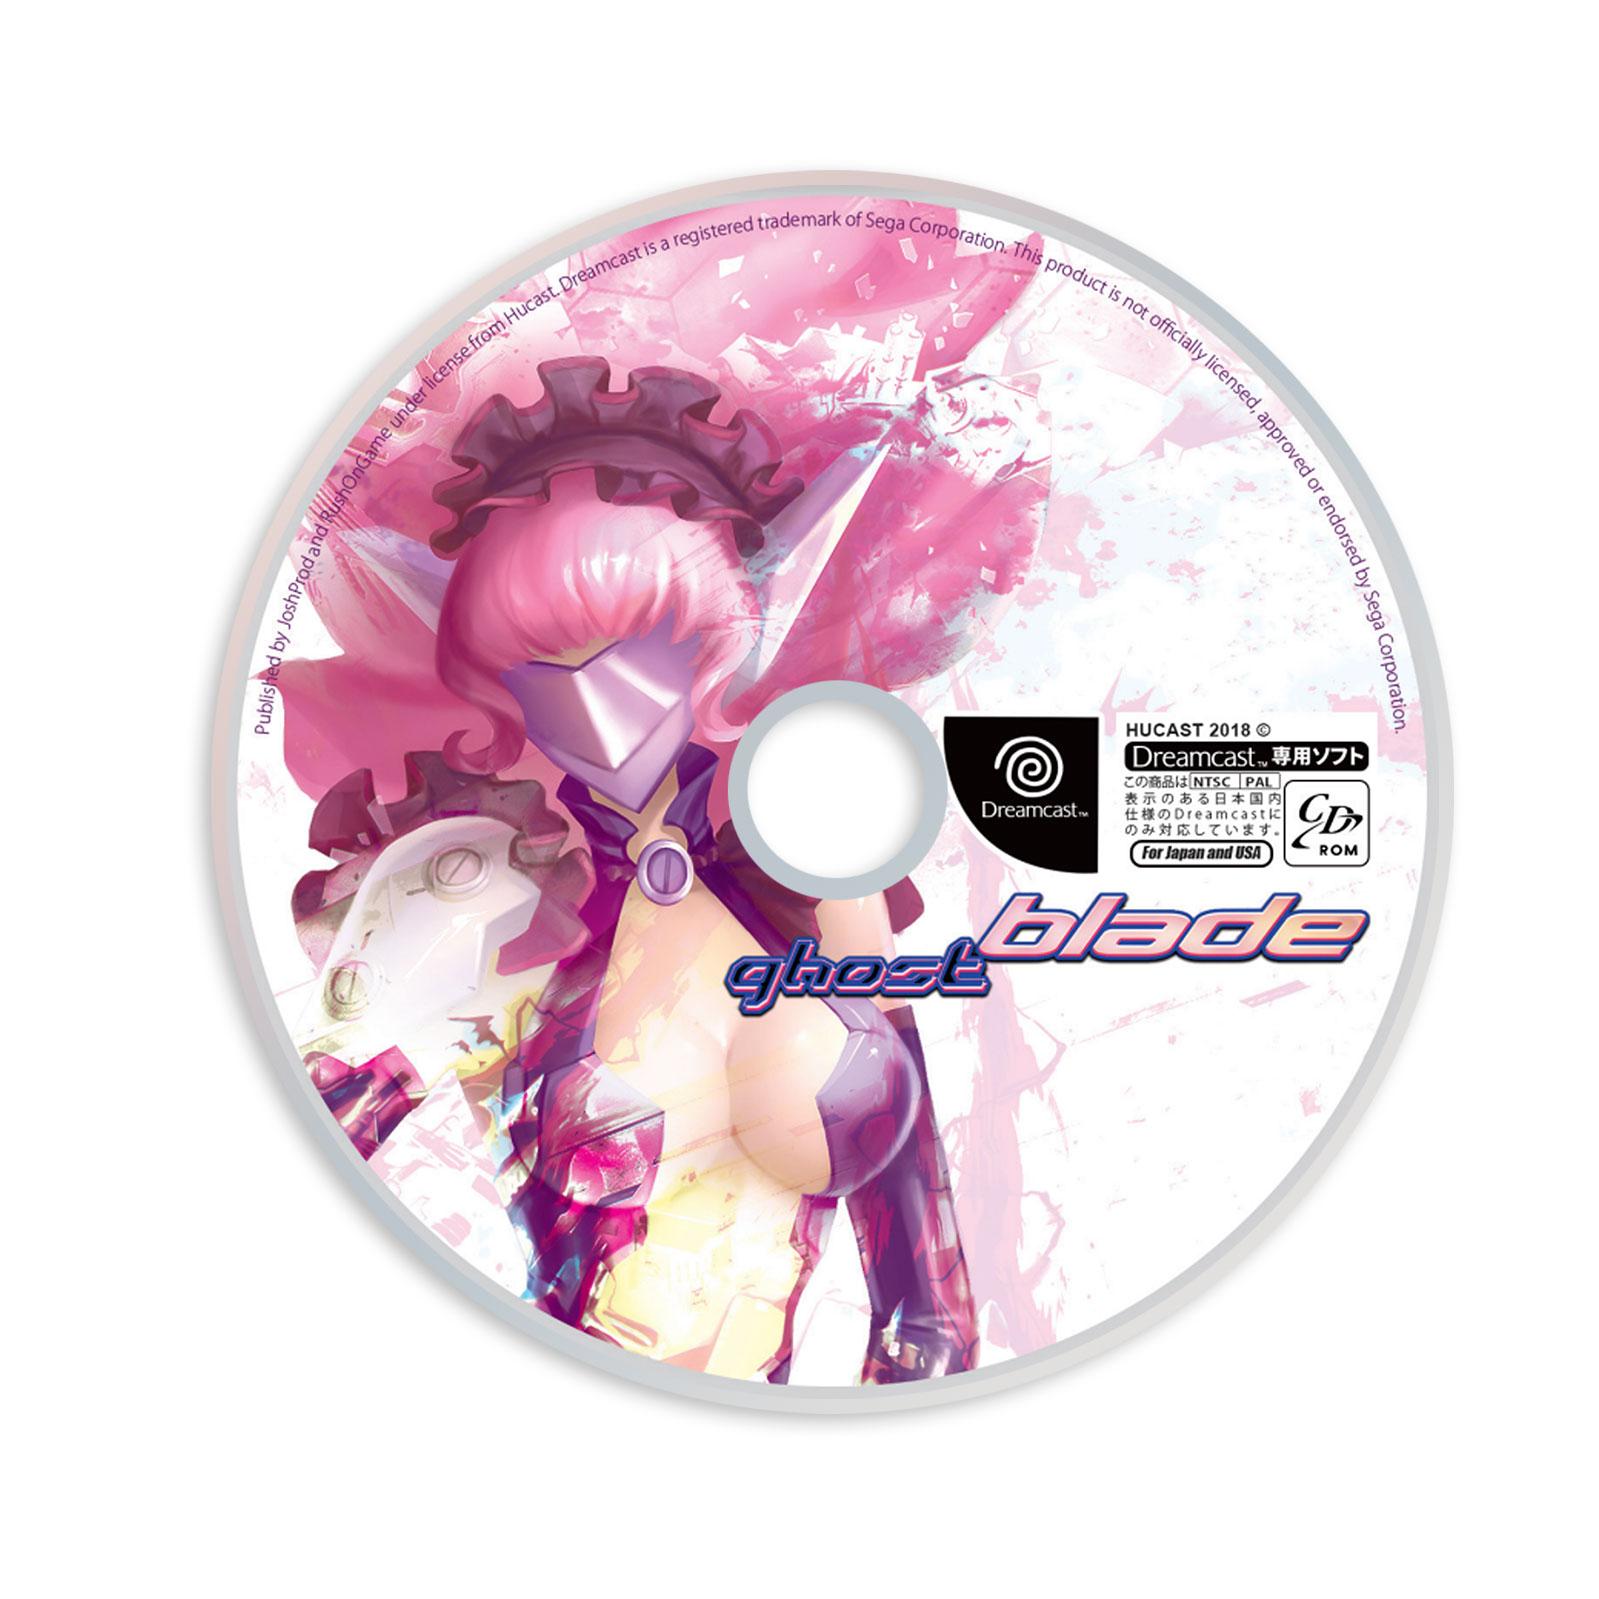 dc-ghost-blade-jp-cd.jpg